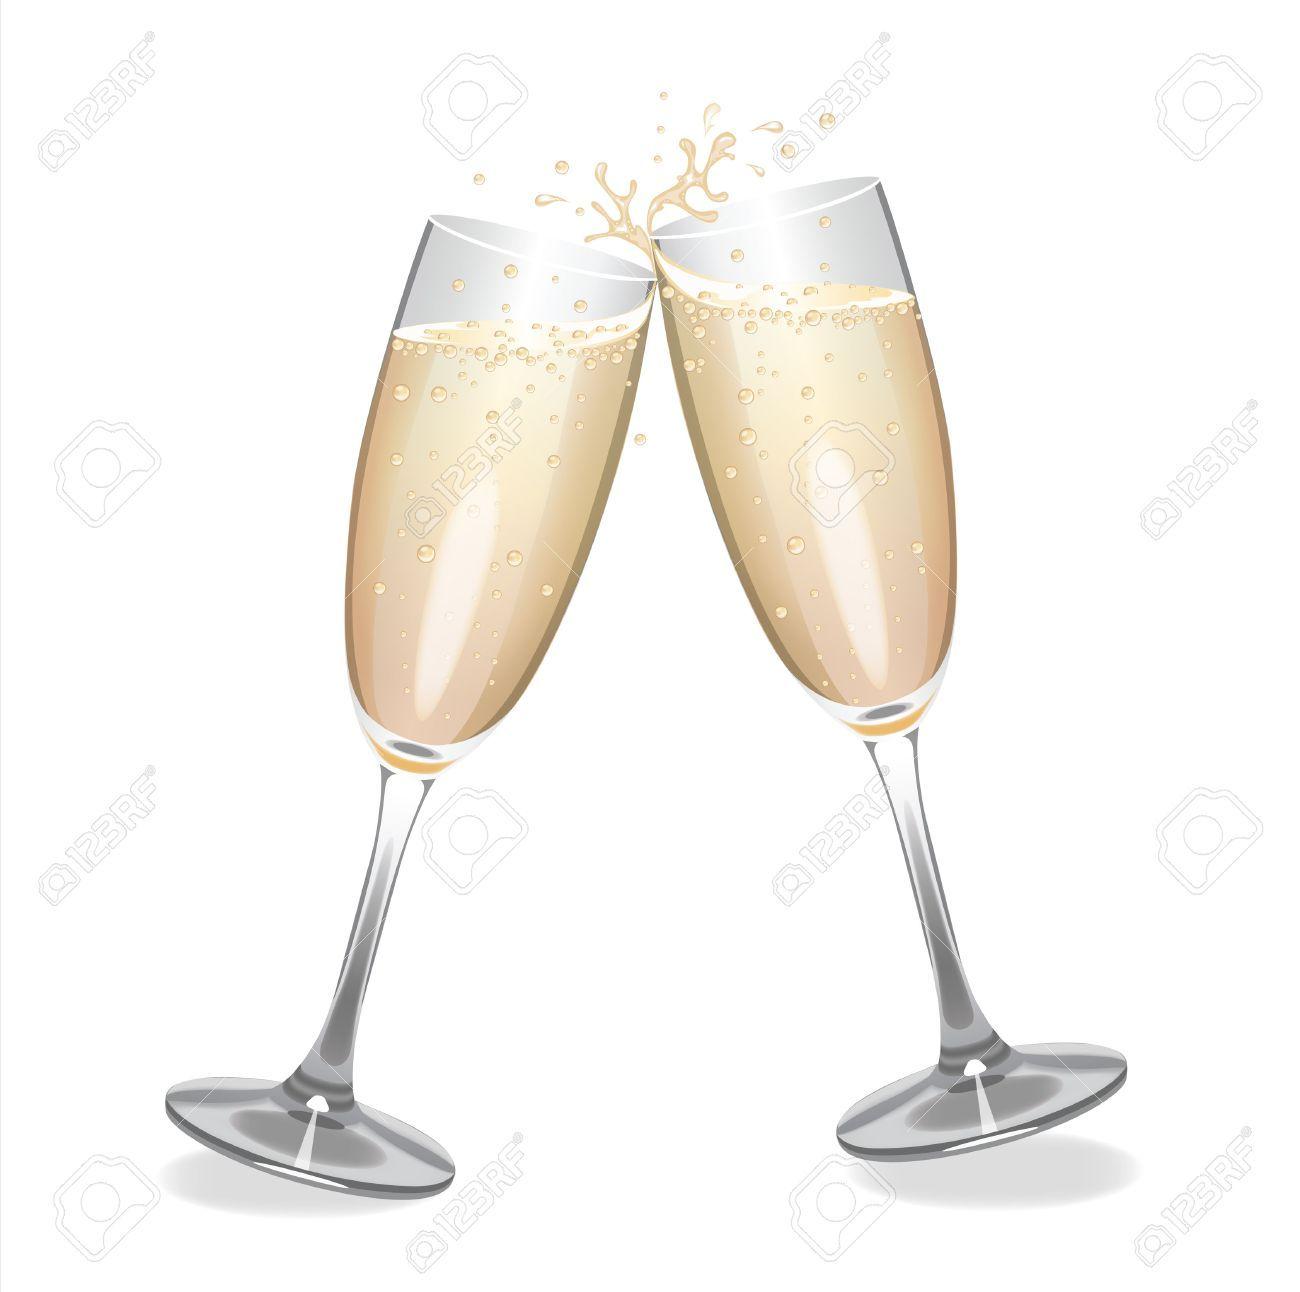 Champagne glass clipart free 3 » Clipart Portal.